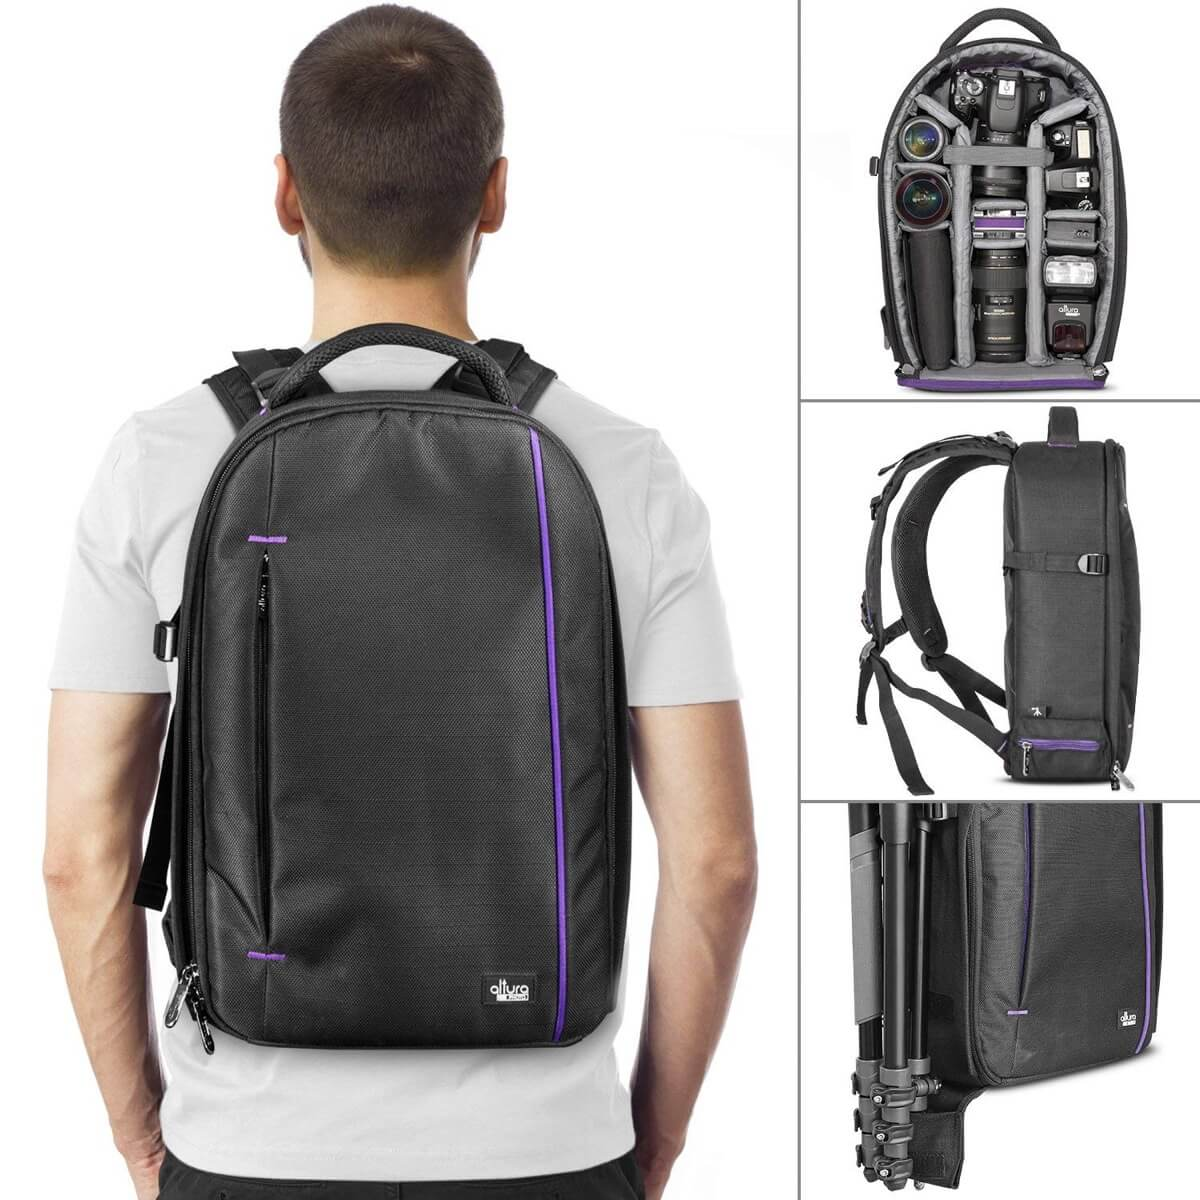 DSLR Camera and Mirrorless Backpack Bag by Altura Photo